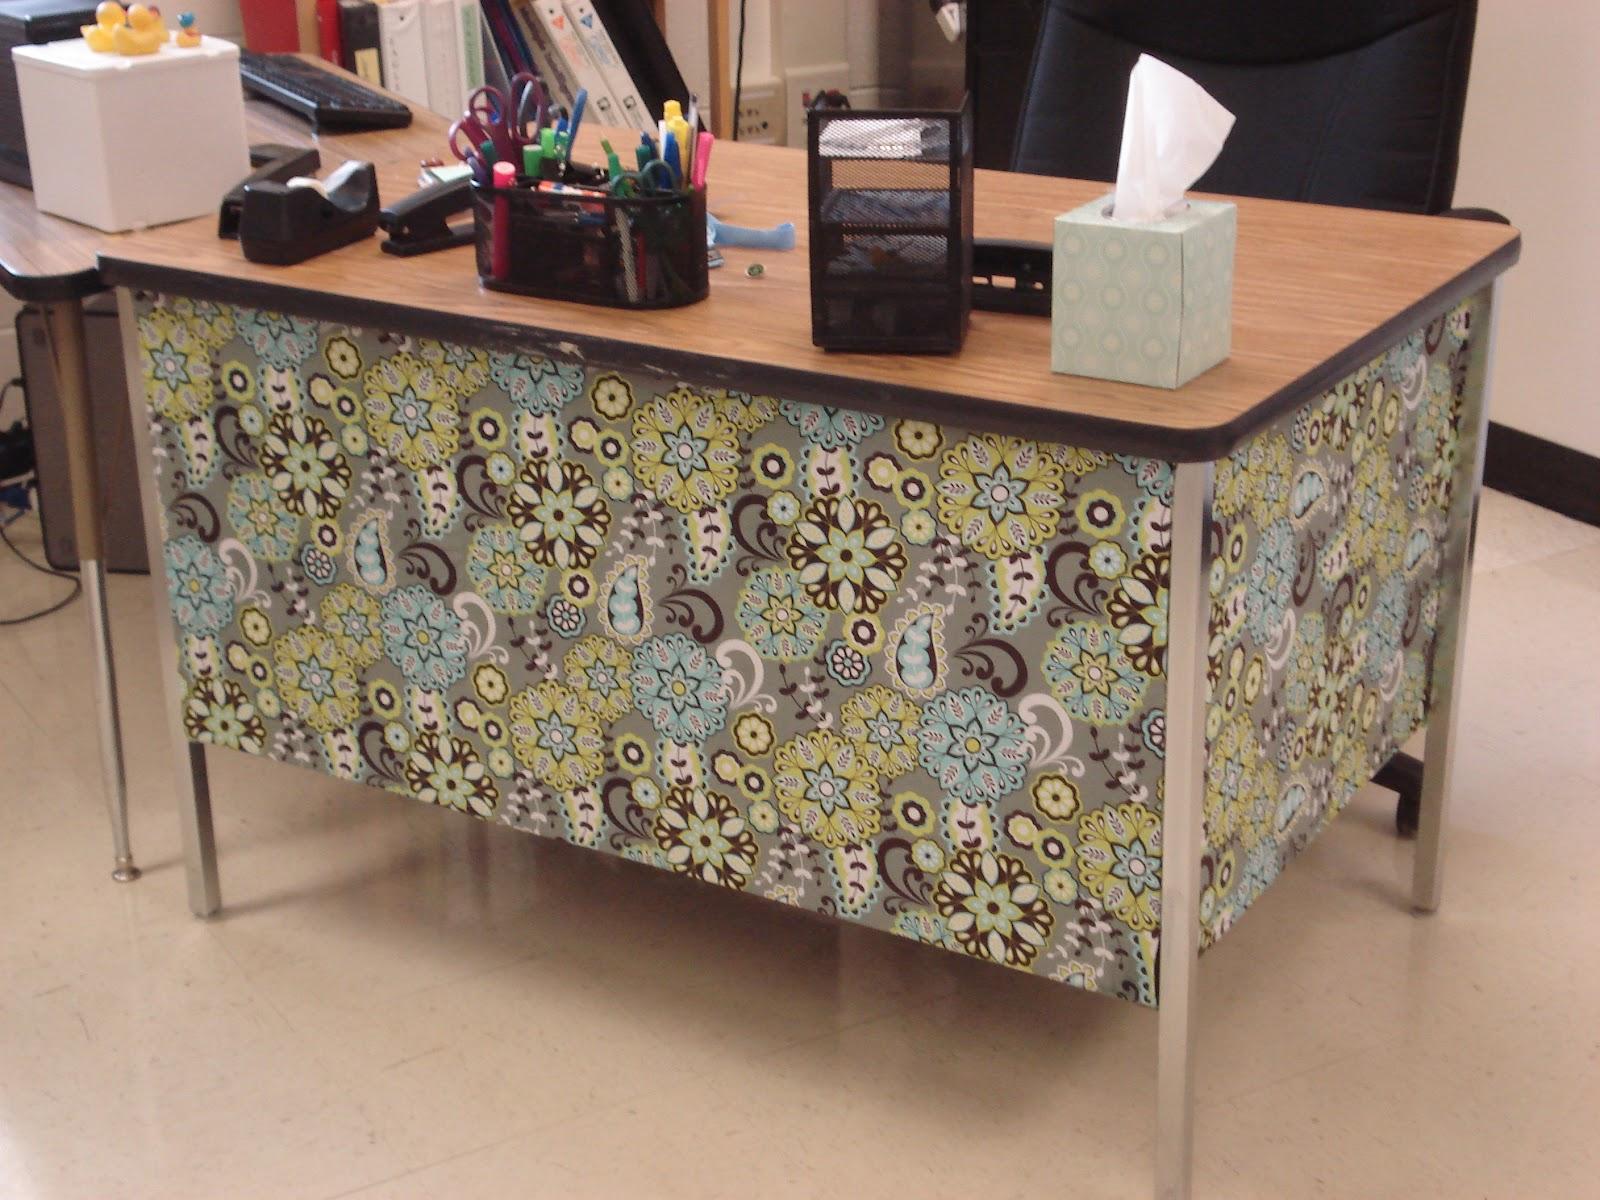 Srsdesign3 Desk Fabric Wrap